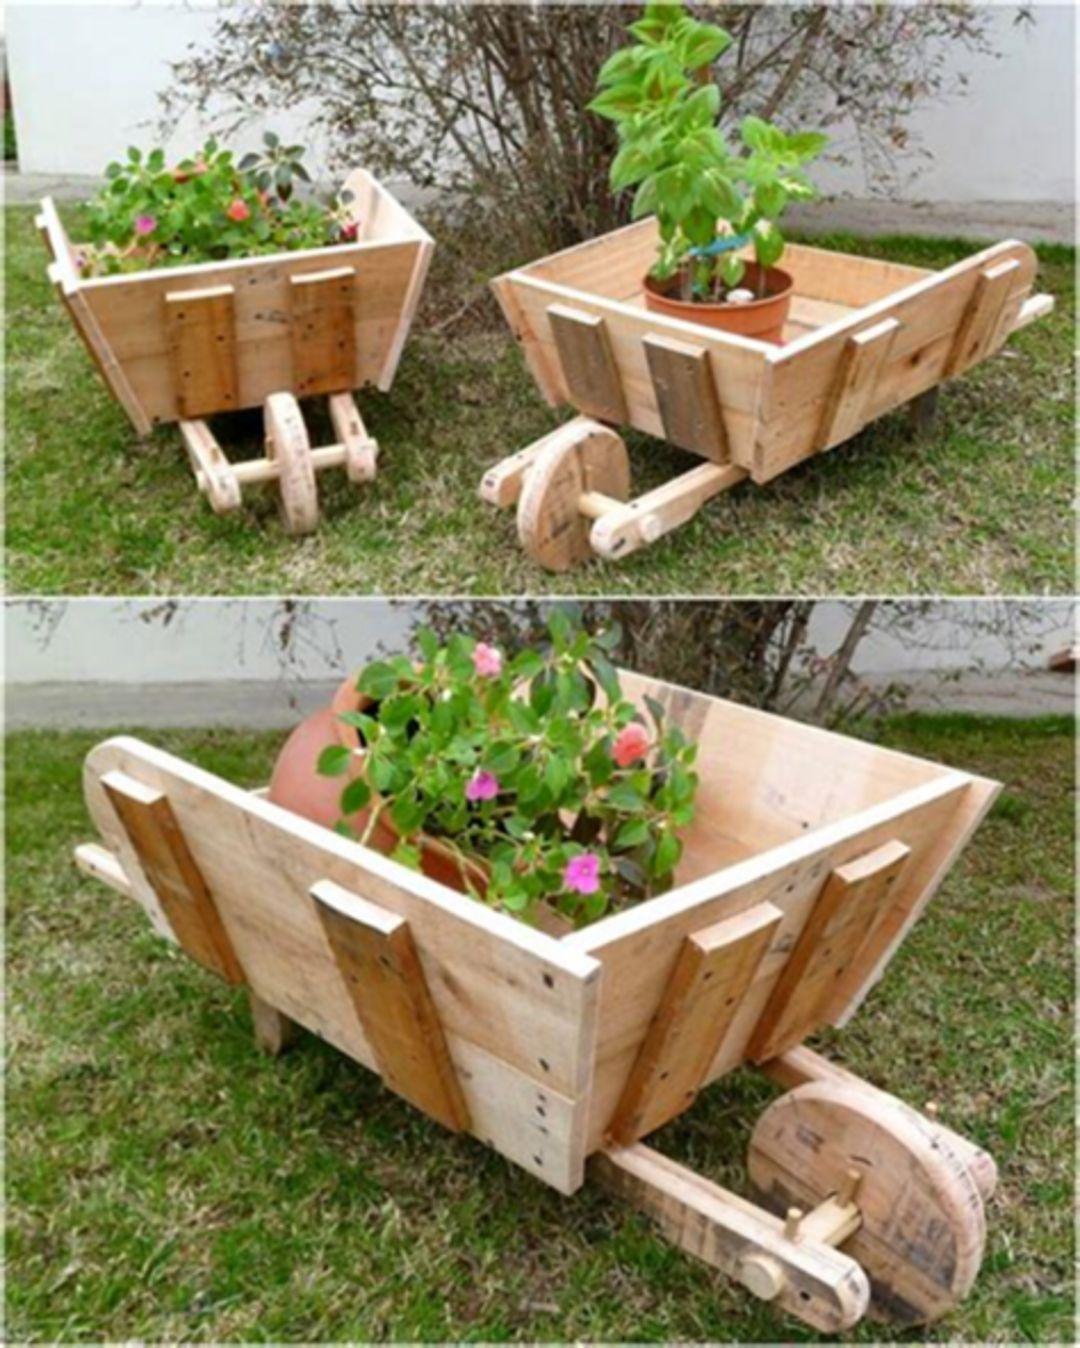 10 Beautiful Diy Garden Decorating Ideas On A Budget Pallets Garden Diy Pallet Wall Wheelbarrow Planter